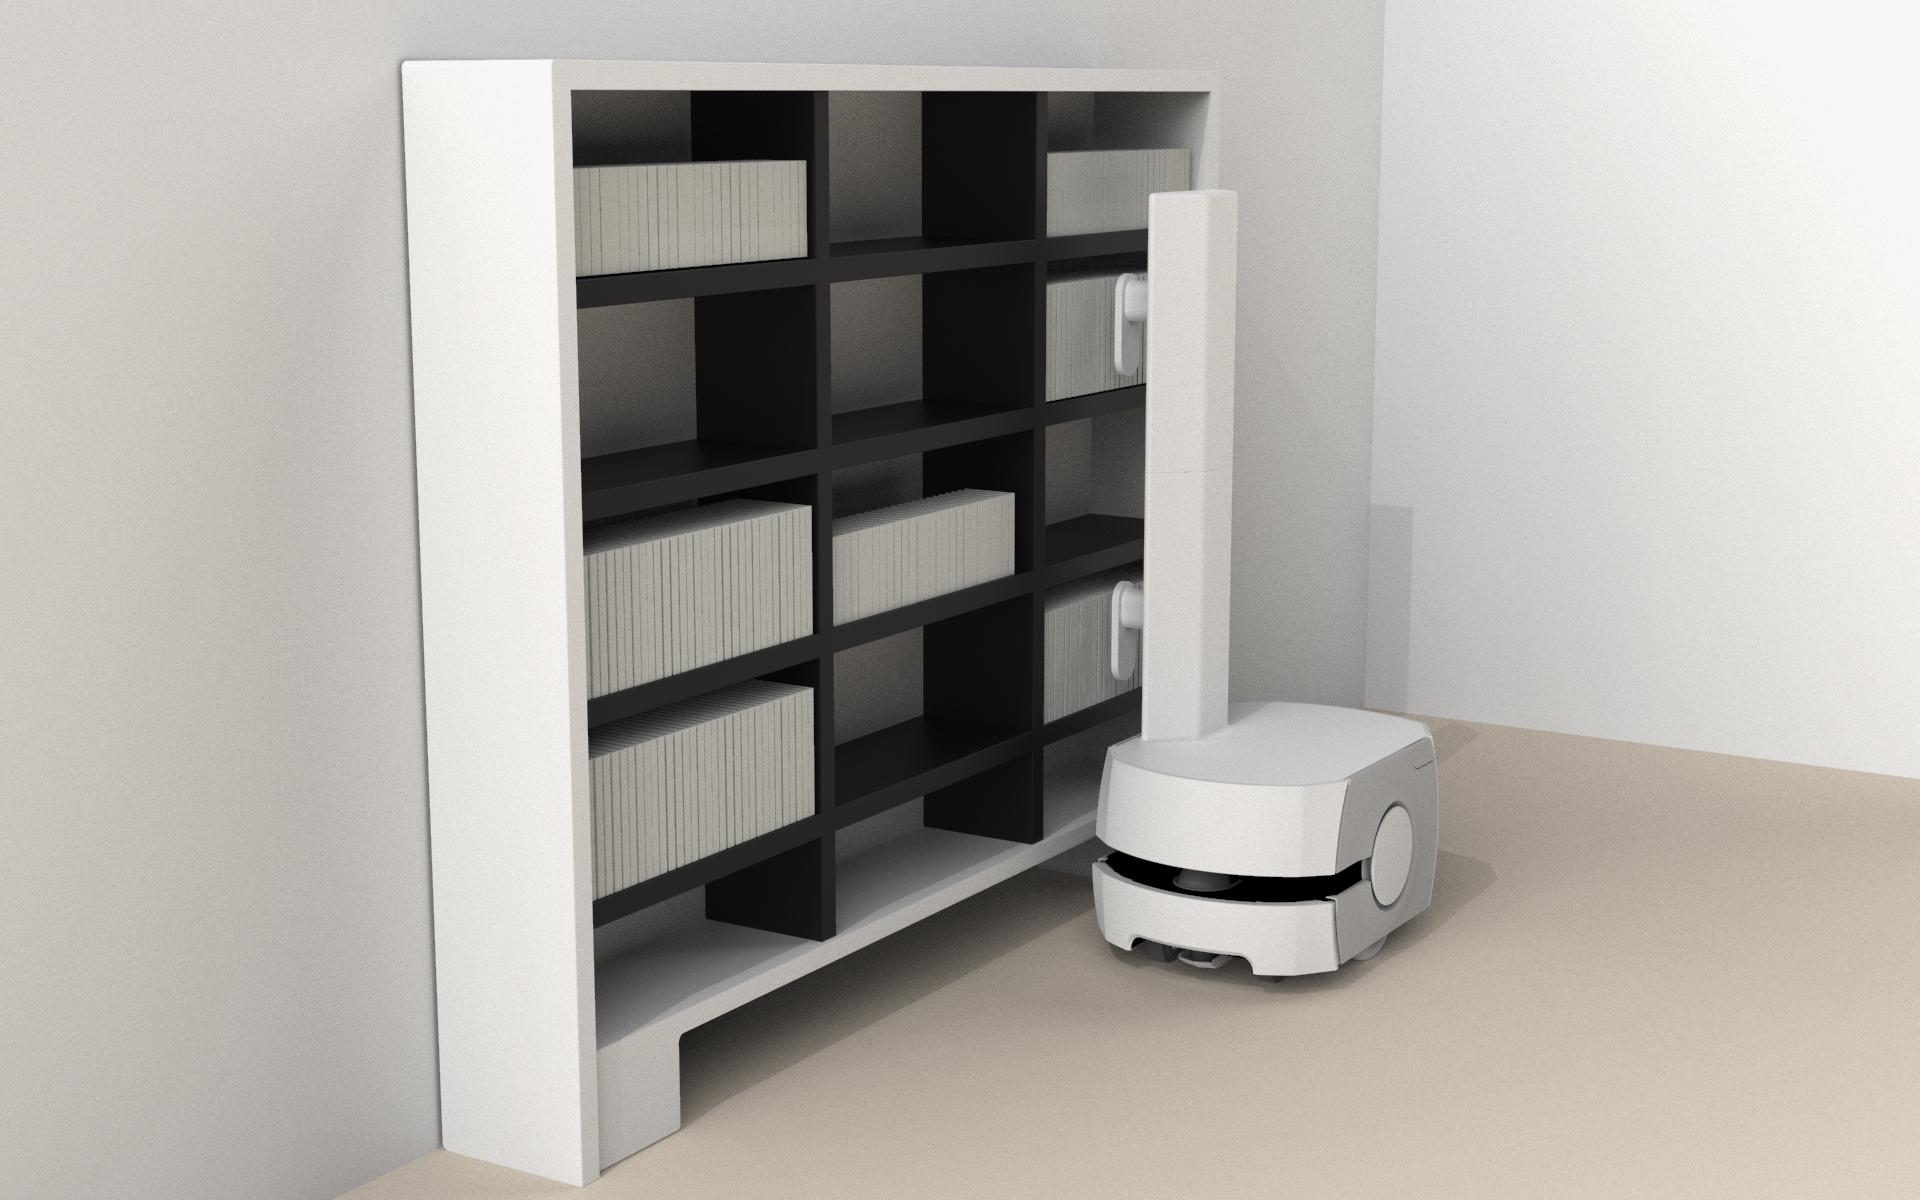 Inventory Robot